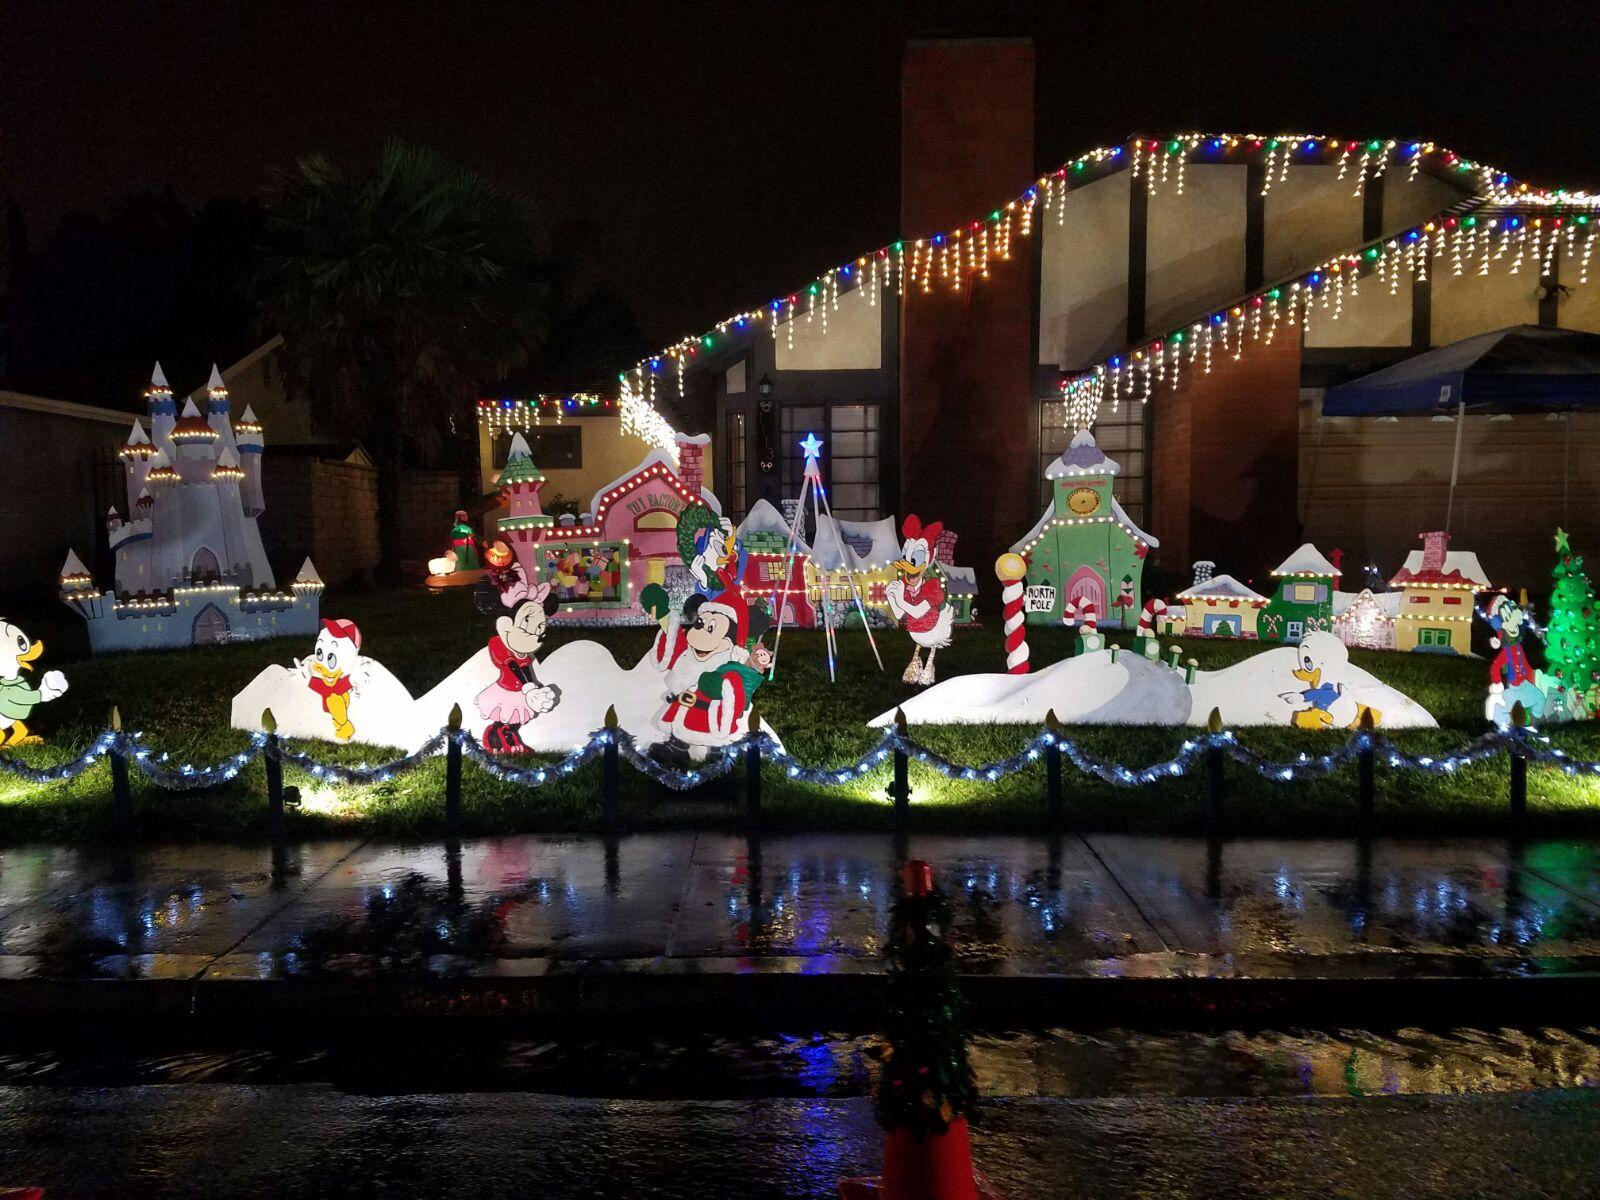 Kitschige Weihnachtsbeleuchtung.Christmas Lights In Camarillo